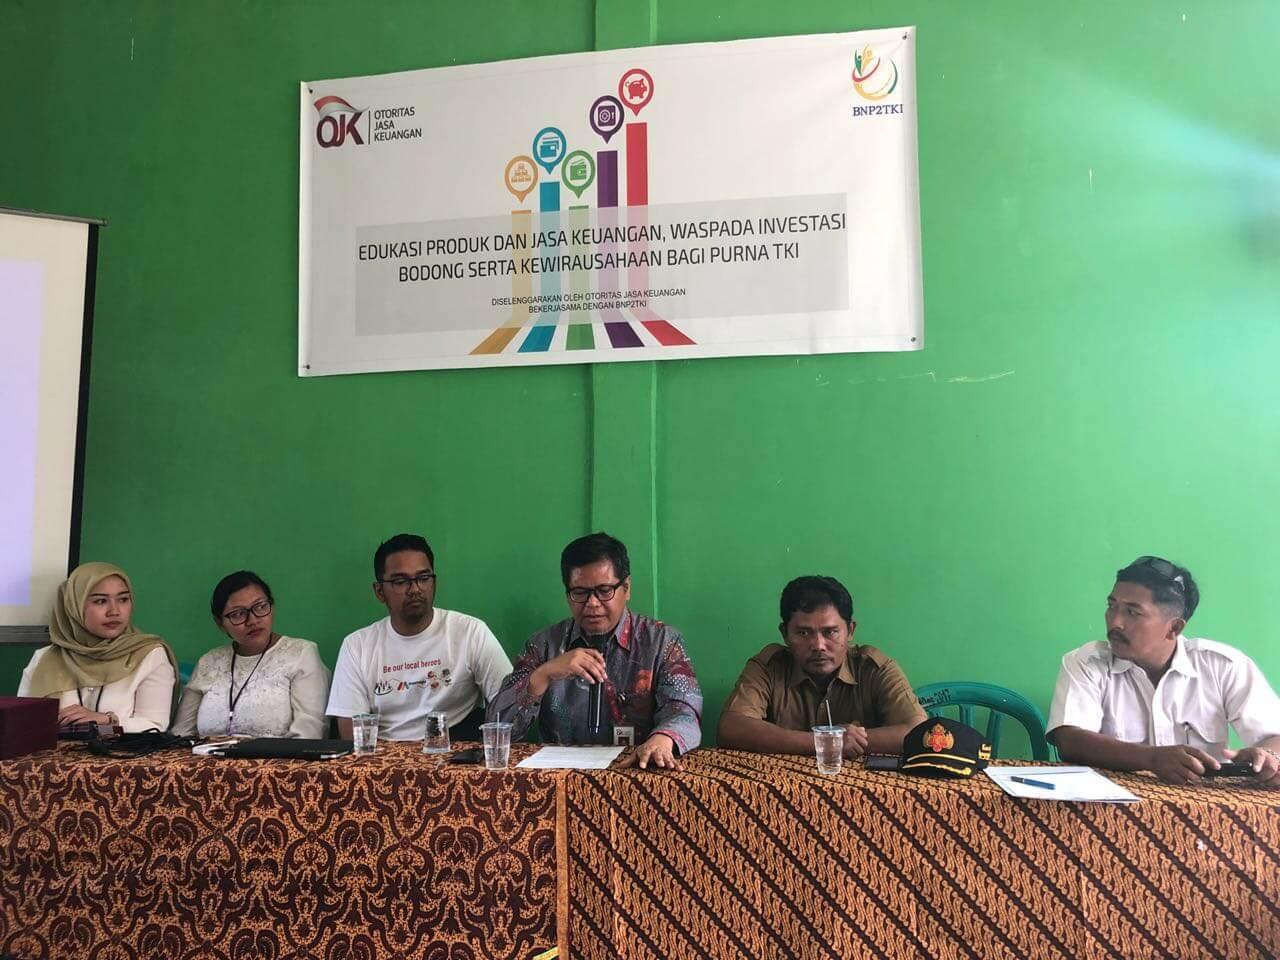 Prima Teguh Prasojo (Ketiga Dari Kiri) Dari Momaju Bersama Dengan Perwakilan Dari OJK dan BNP2TKI Pada Kegiatan OJK Mengajar